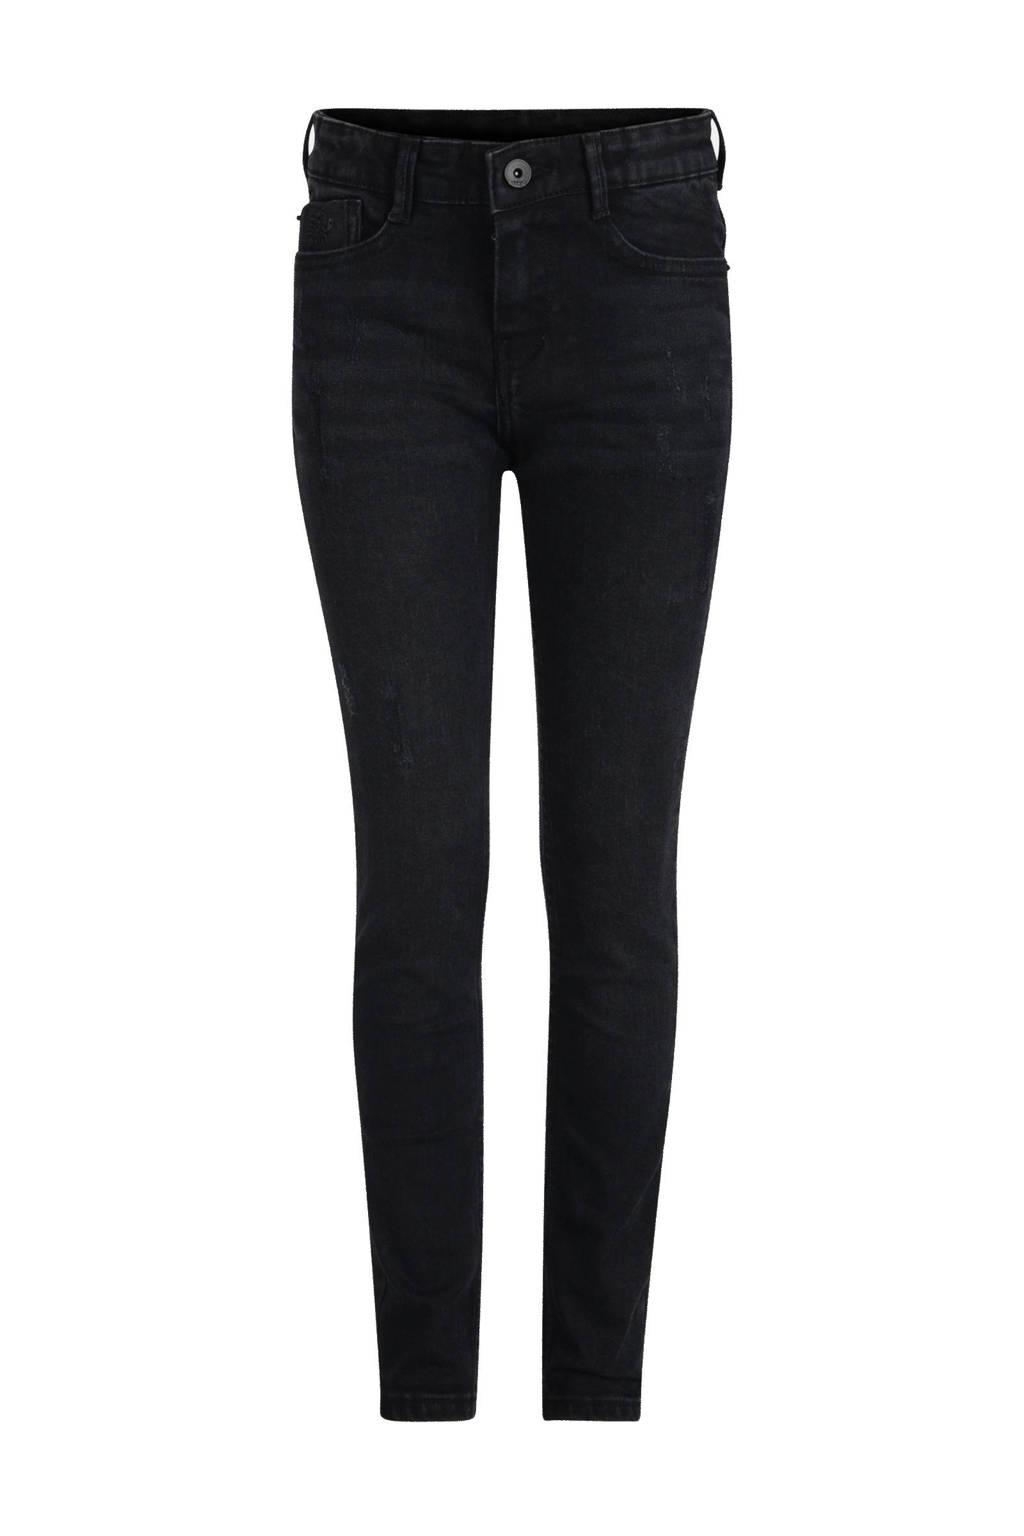 Jill & Mitch by Shoeby slim fit jeans black denim, Black denim